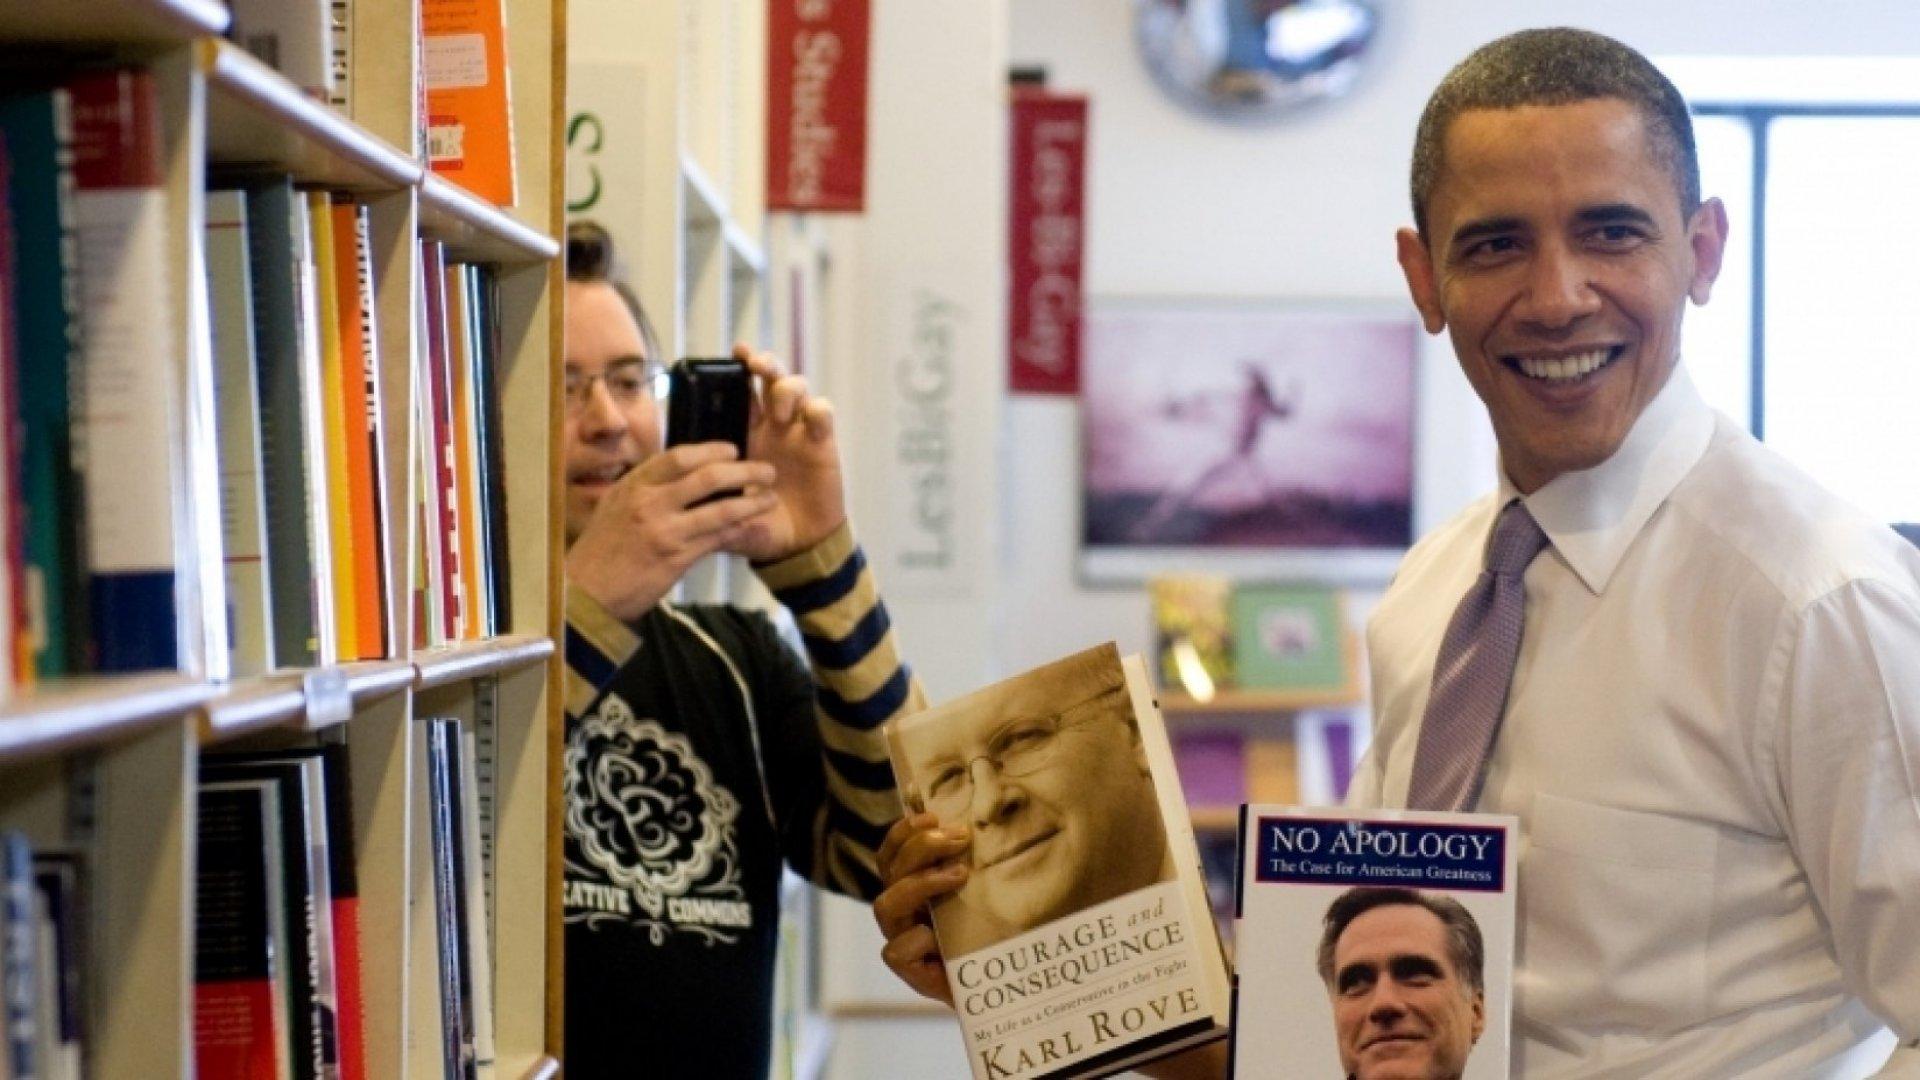 Obama's Picks For Best Novels of All Time